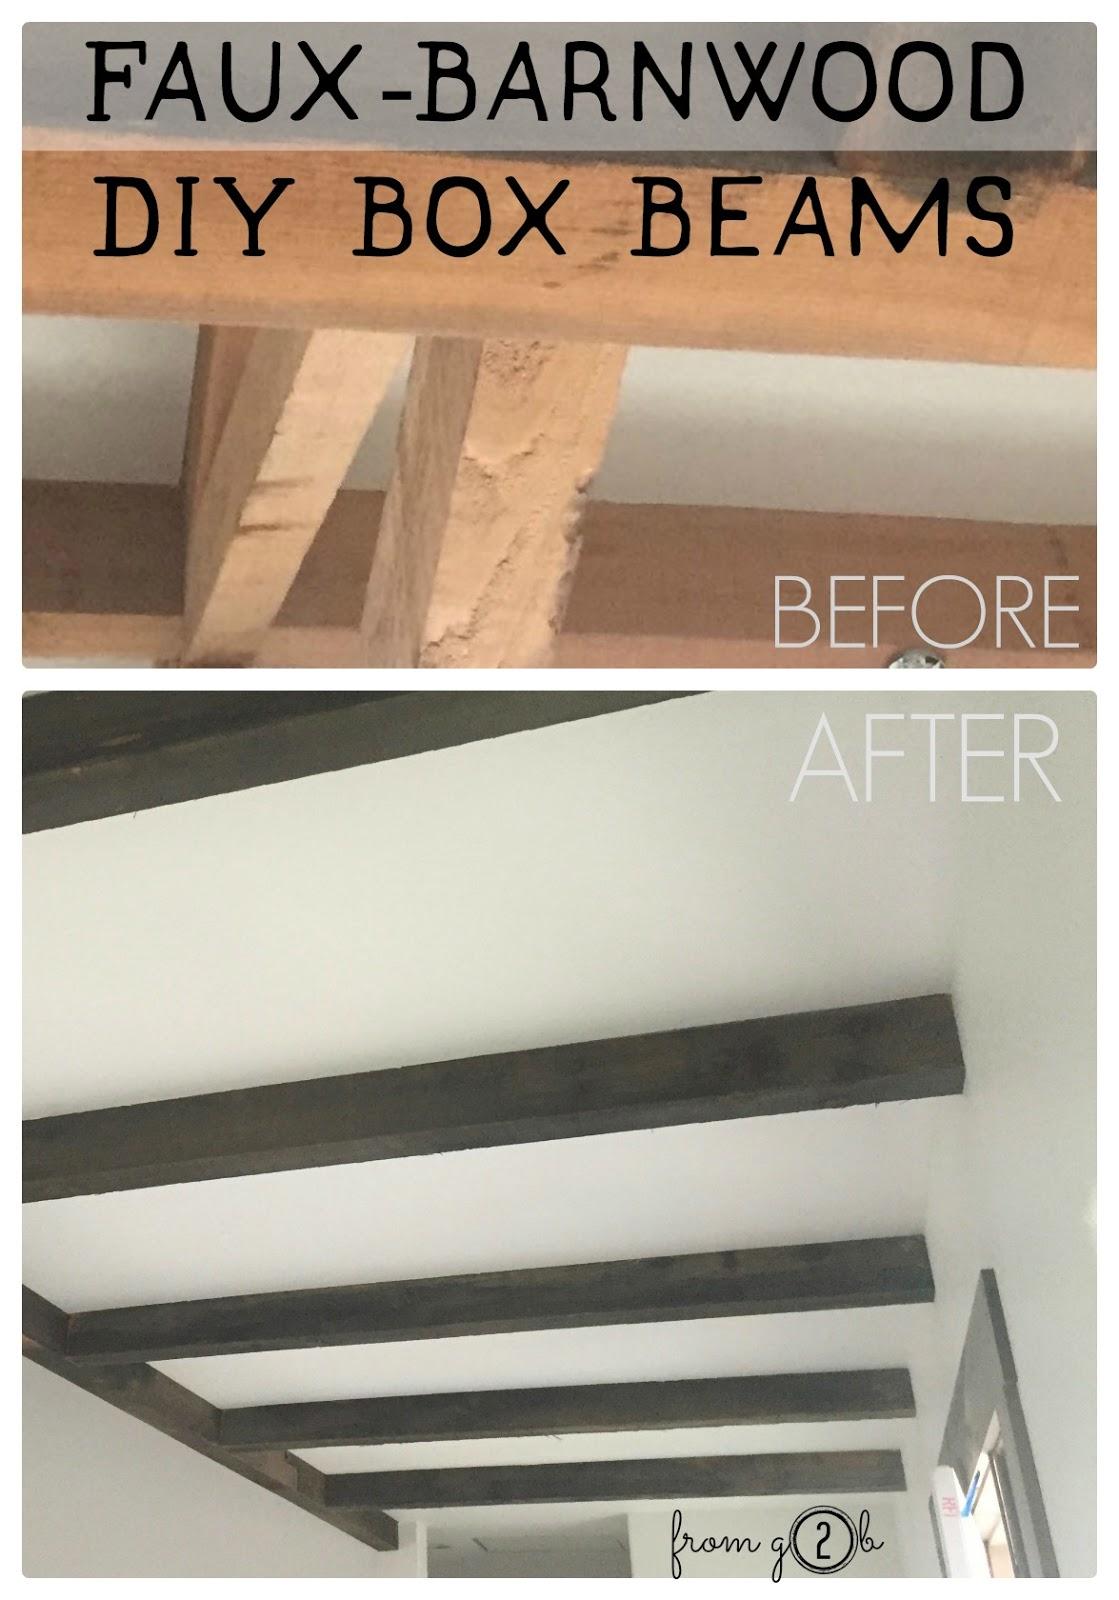 from Gardners 2 Bergers: Faux-Barnwood DIY Box Beams